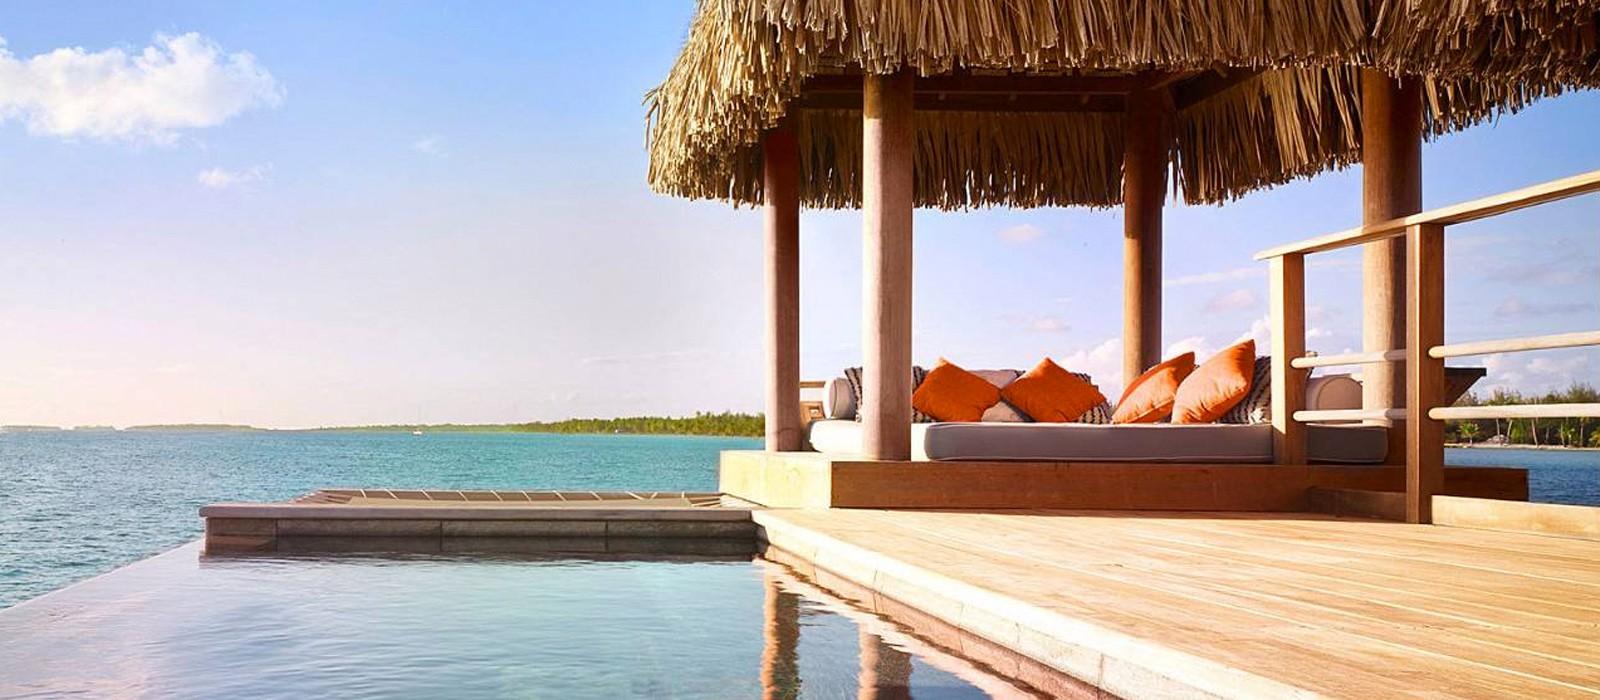 four seasons bora bora - Luxury Bora Bora Holidays - Header